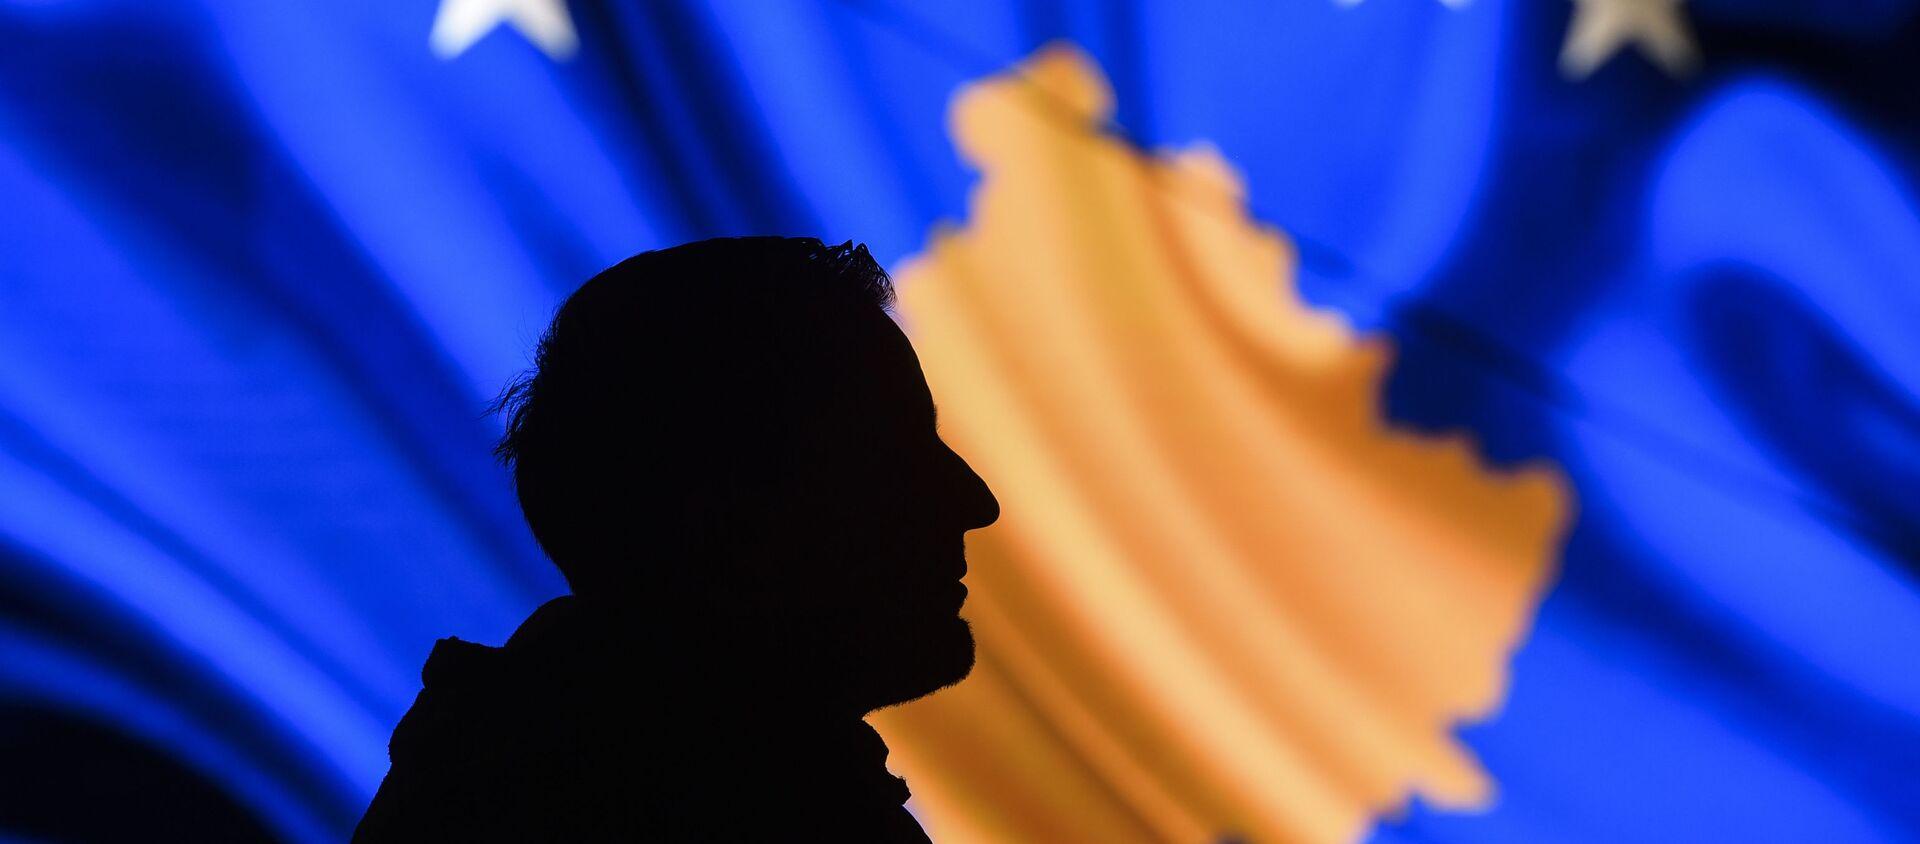 Flaga Kosowa. - Sputnik Polska, 1920, 01.08.2020